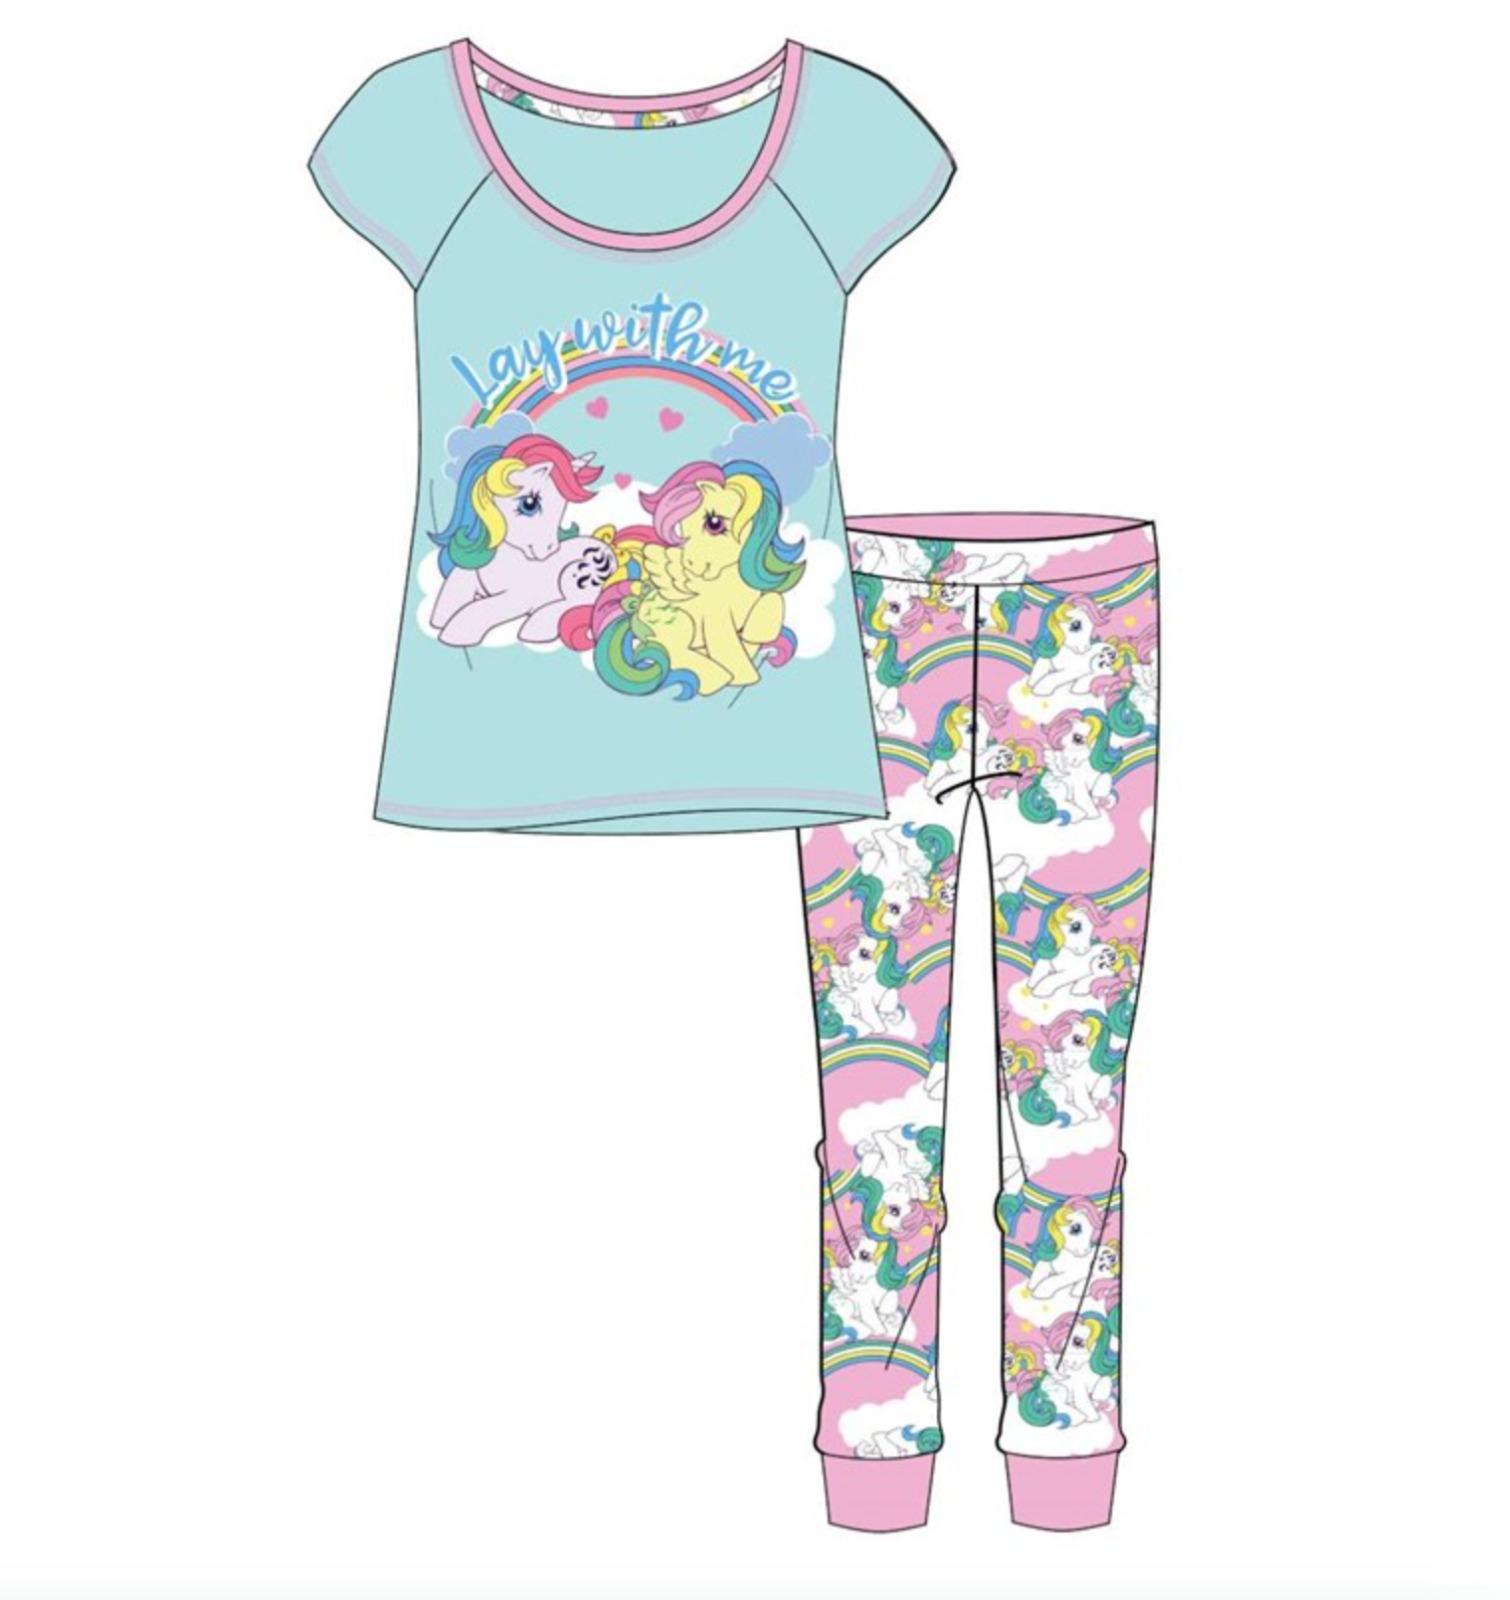 My Little Pony 'Lay with Me'  Pj's